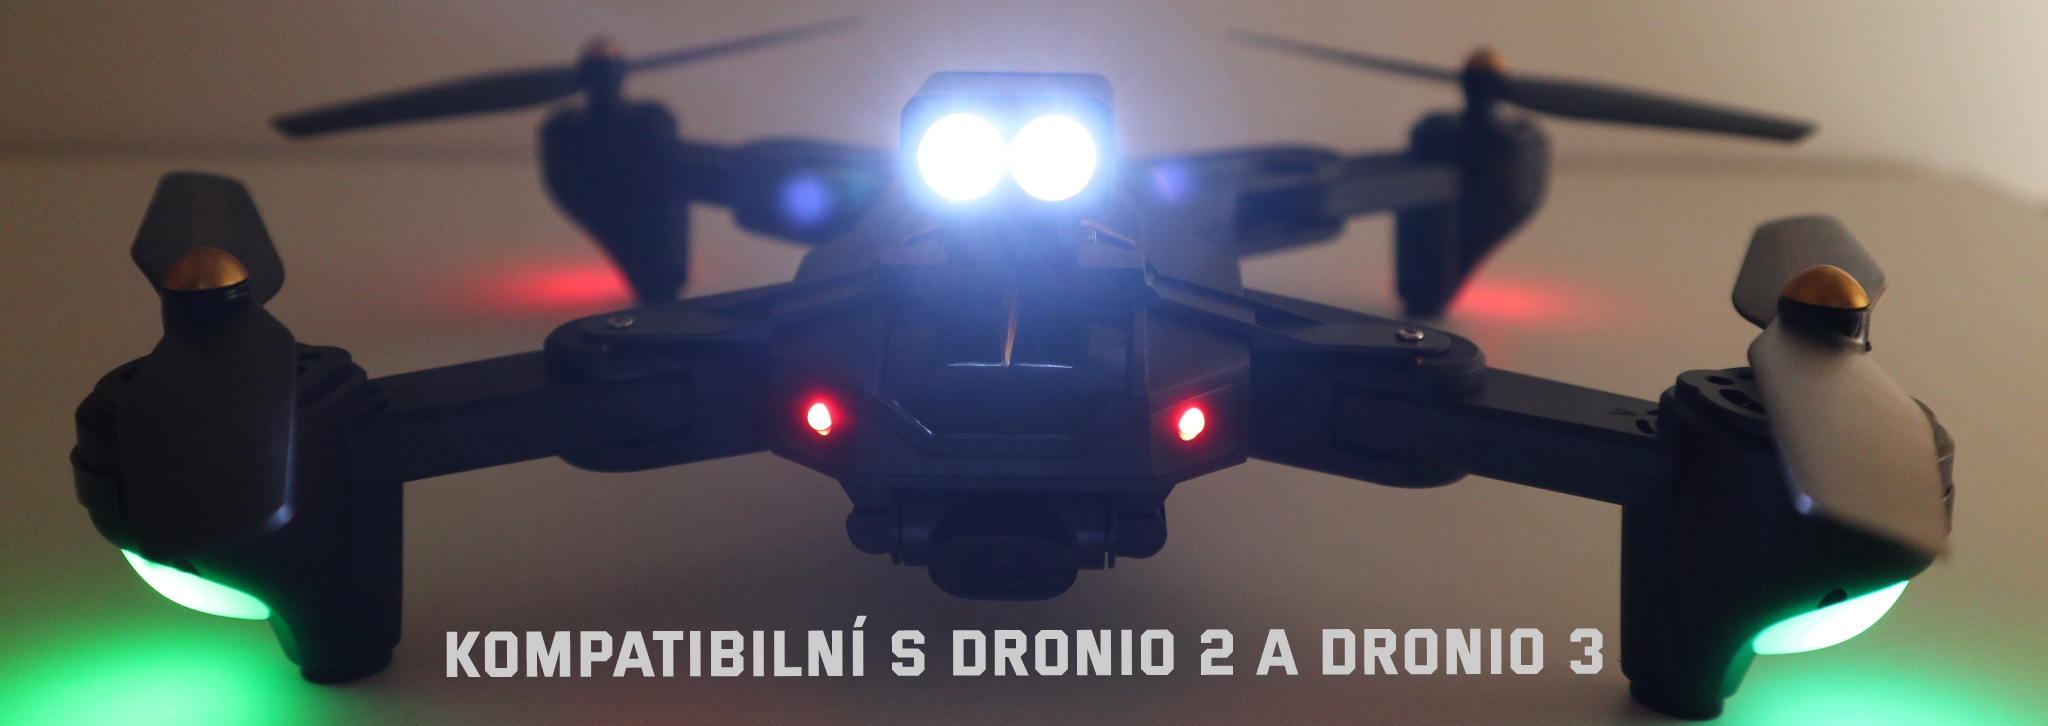 Svítilna pro drony Dronio 2 a Dronio 3